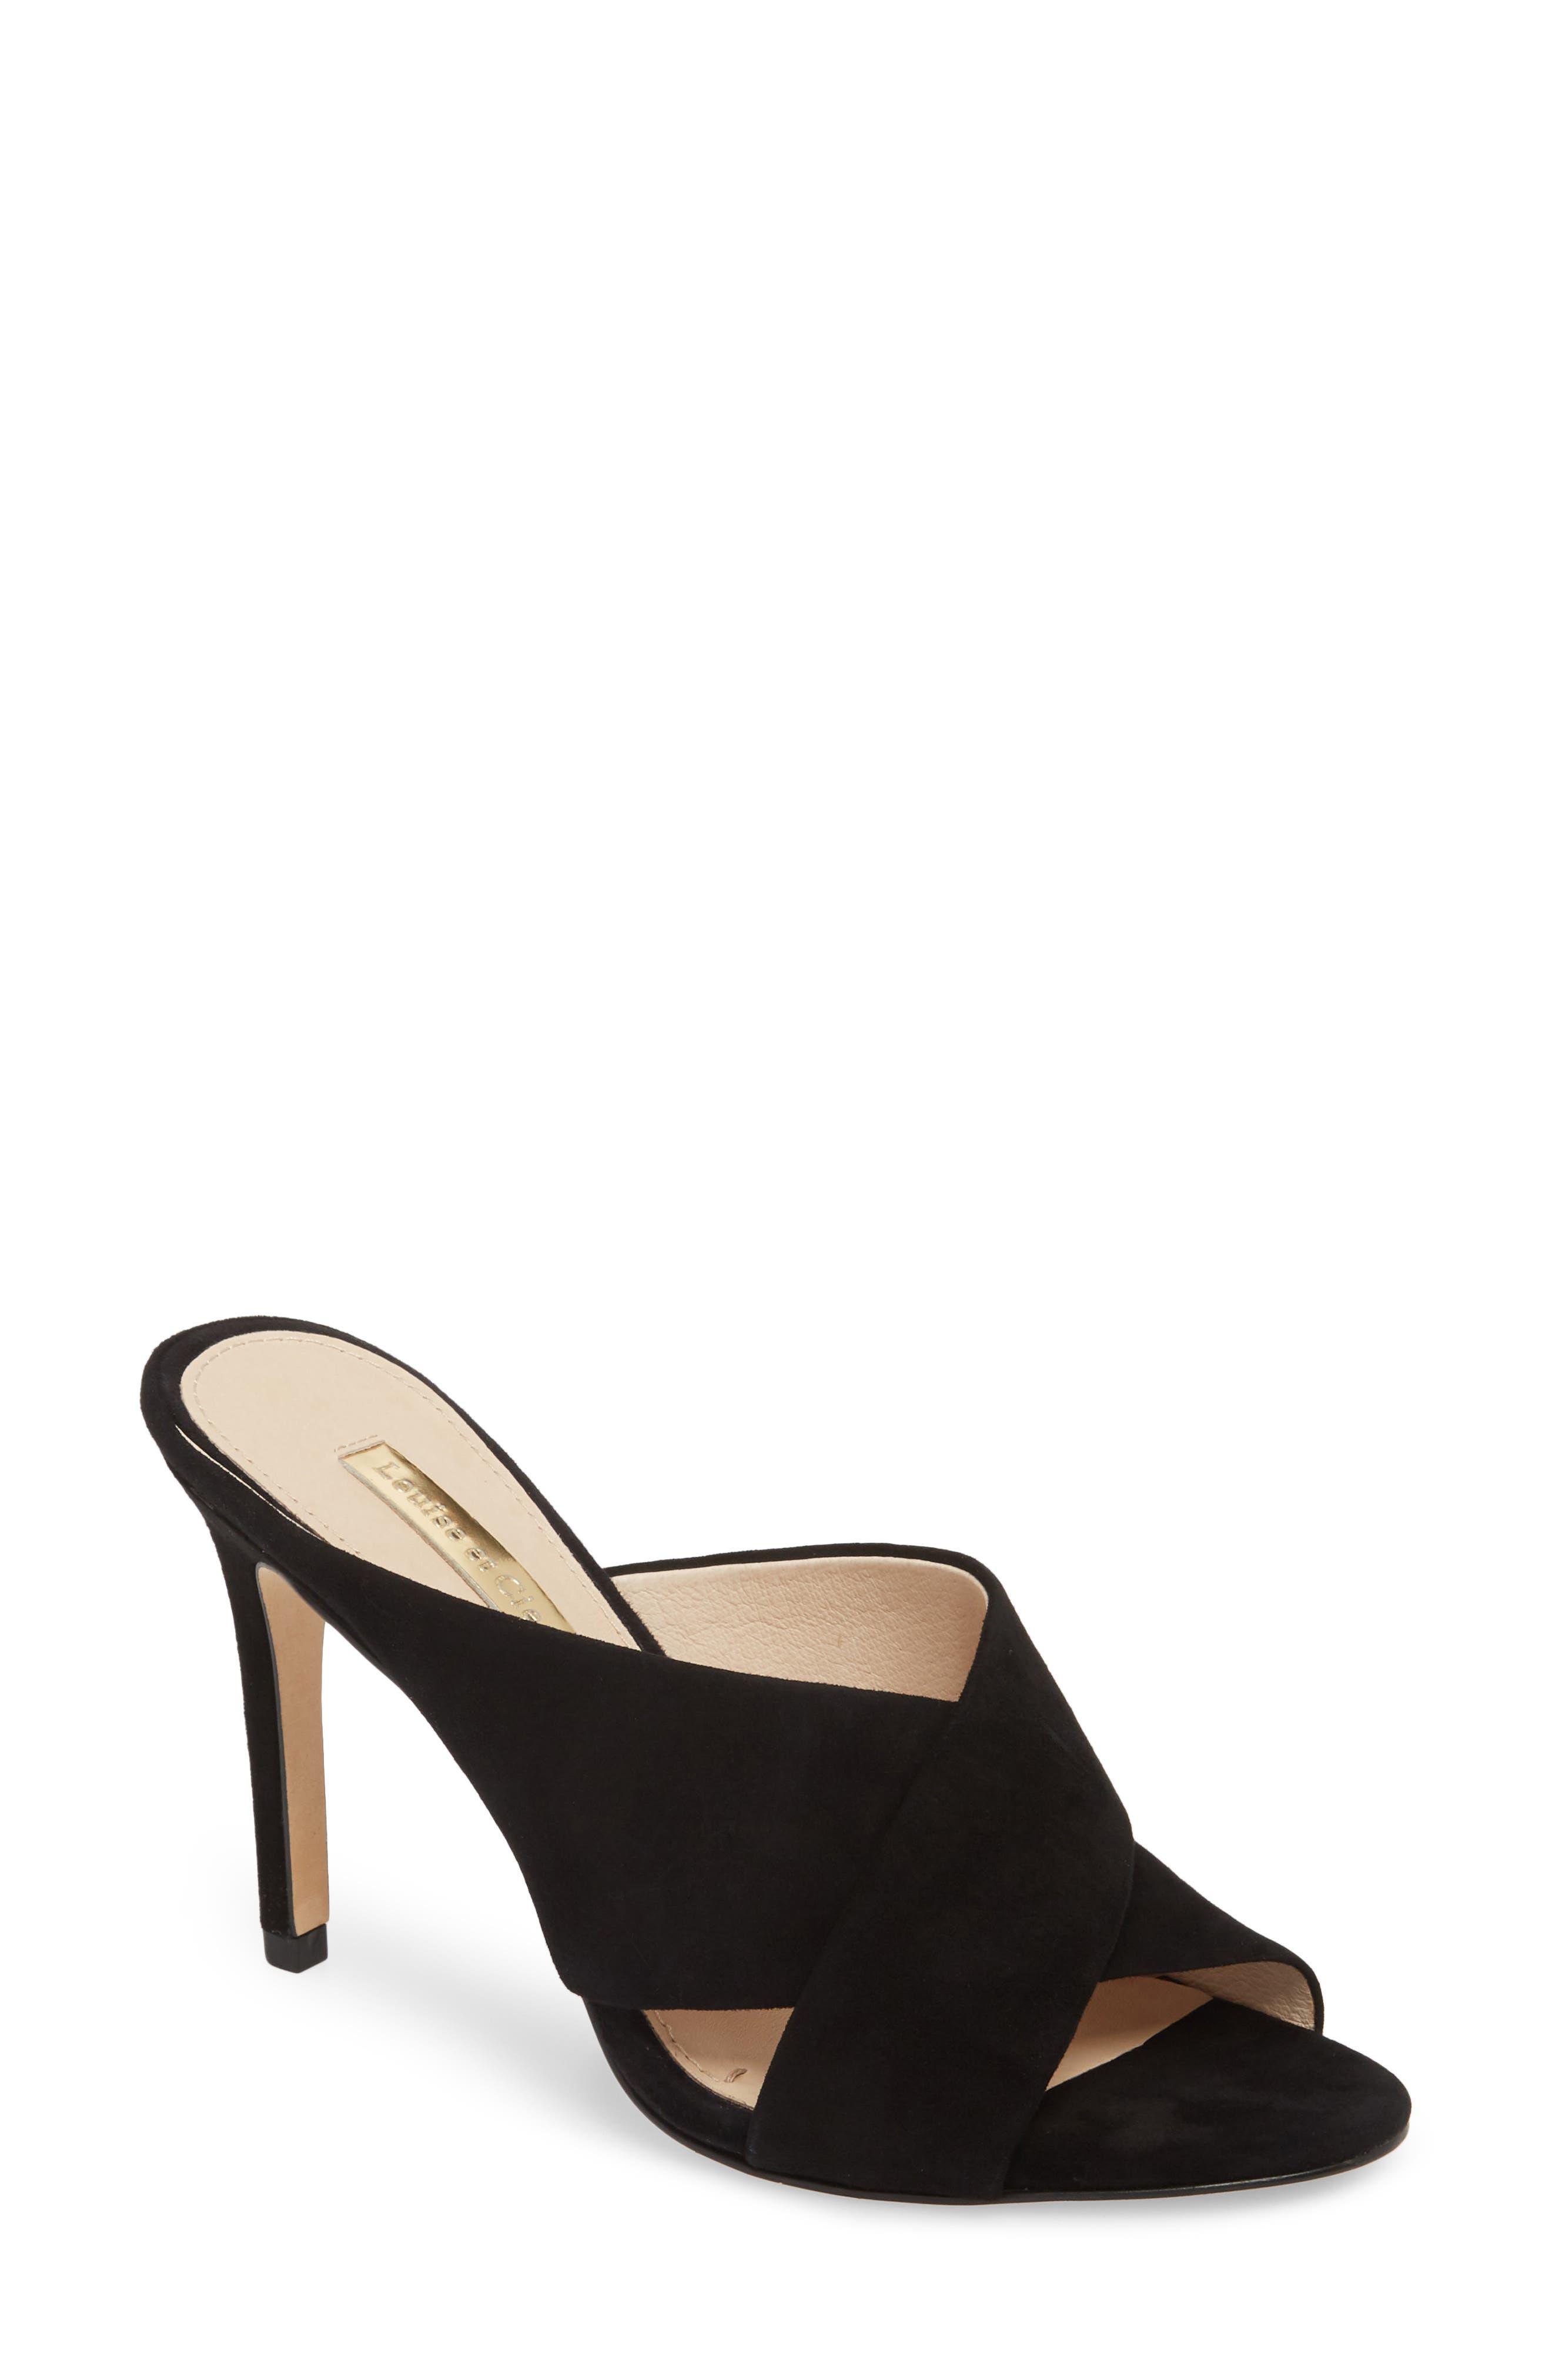 Halloway II Sandal,                         Main,                         color, Black Suede